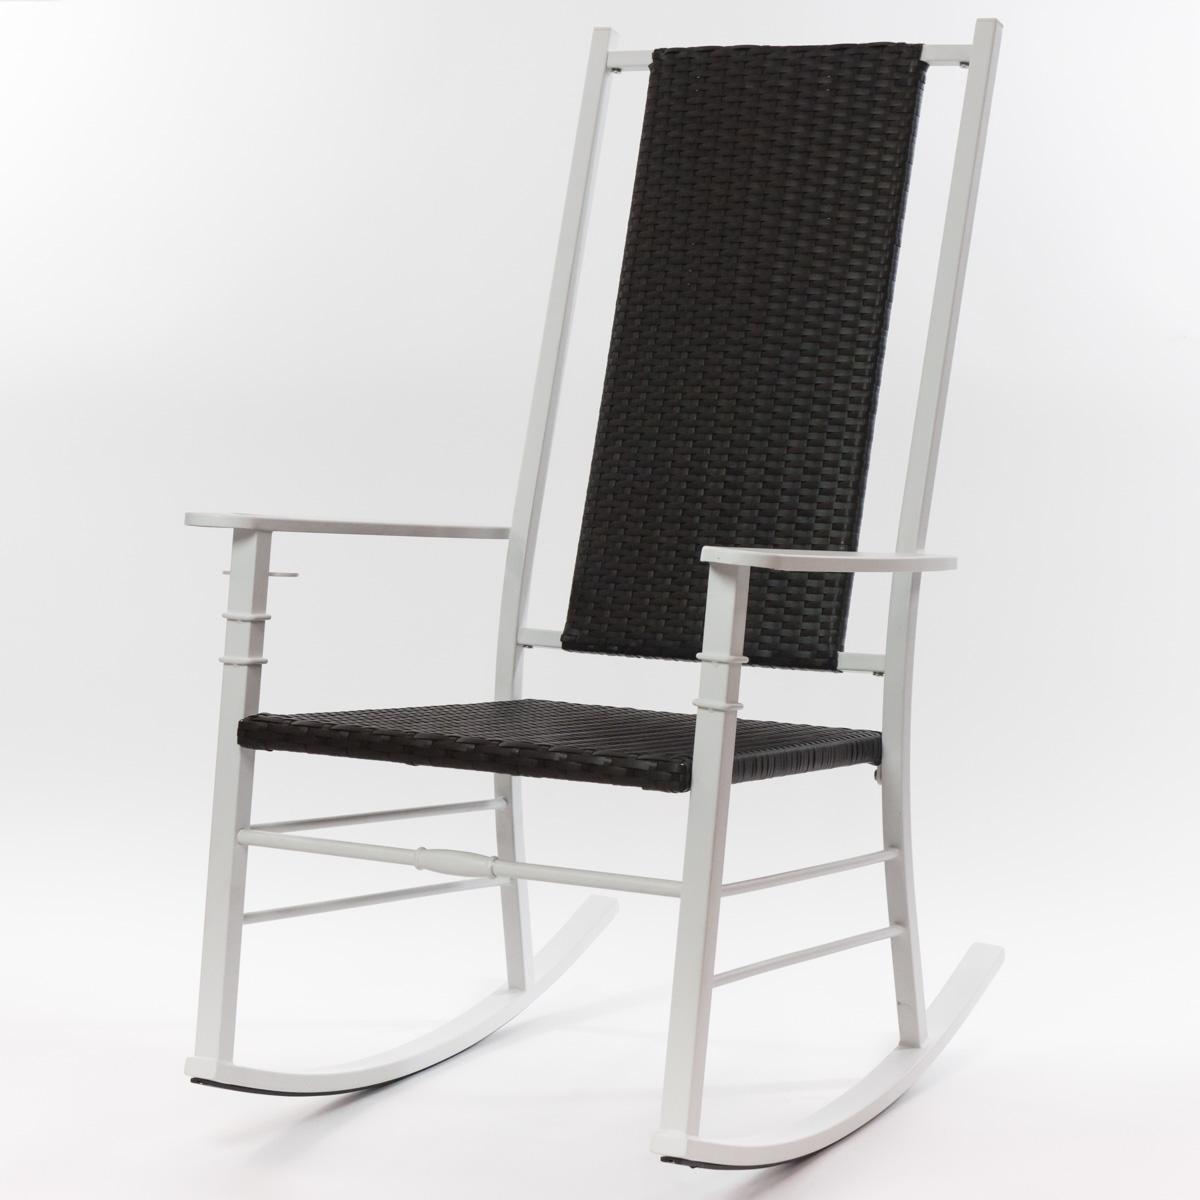 Rocking Chairs Cracker Barrel